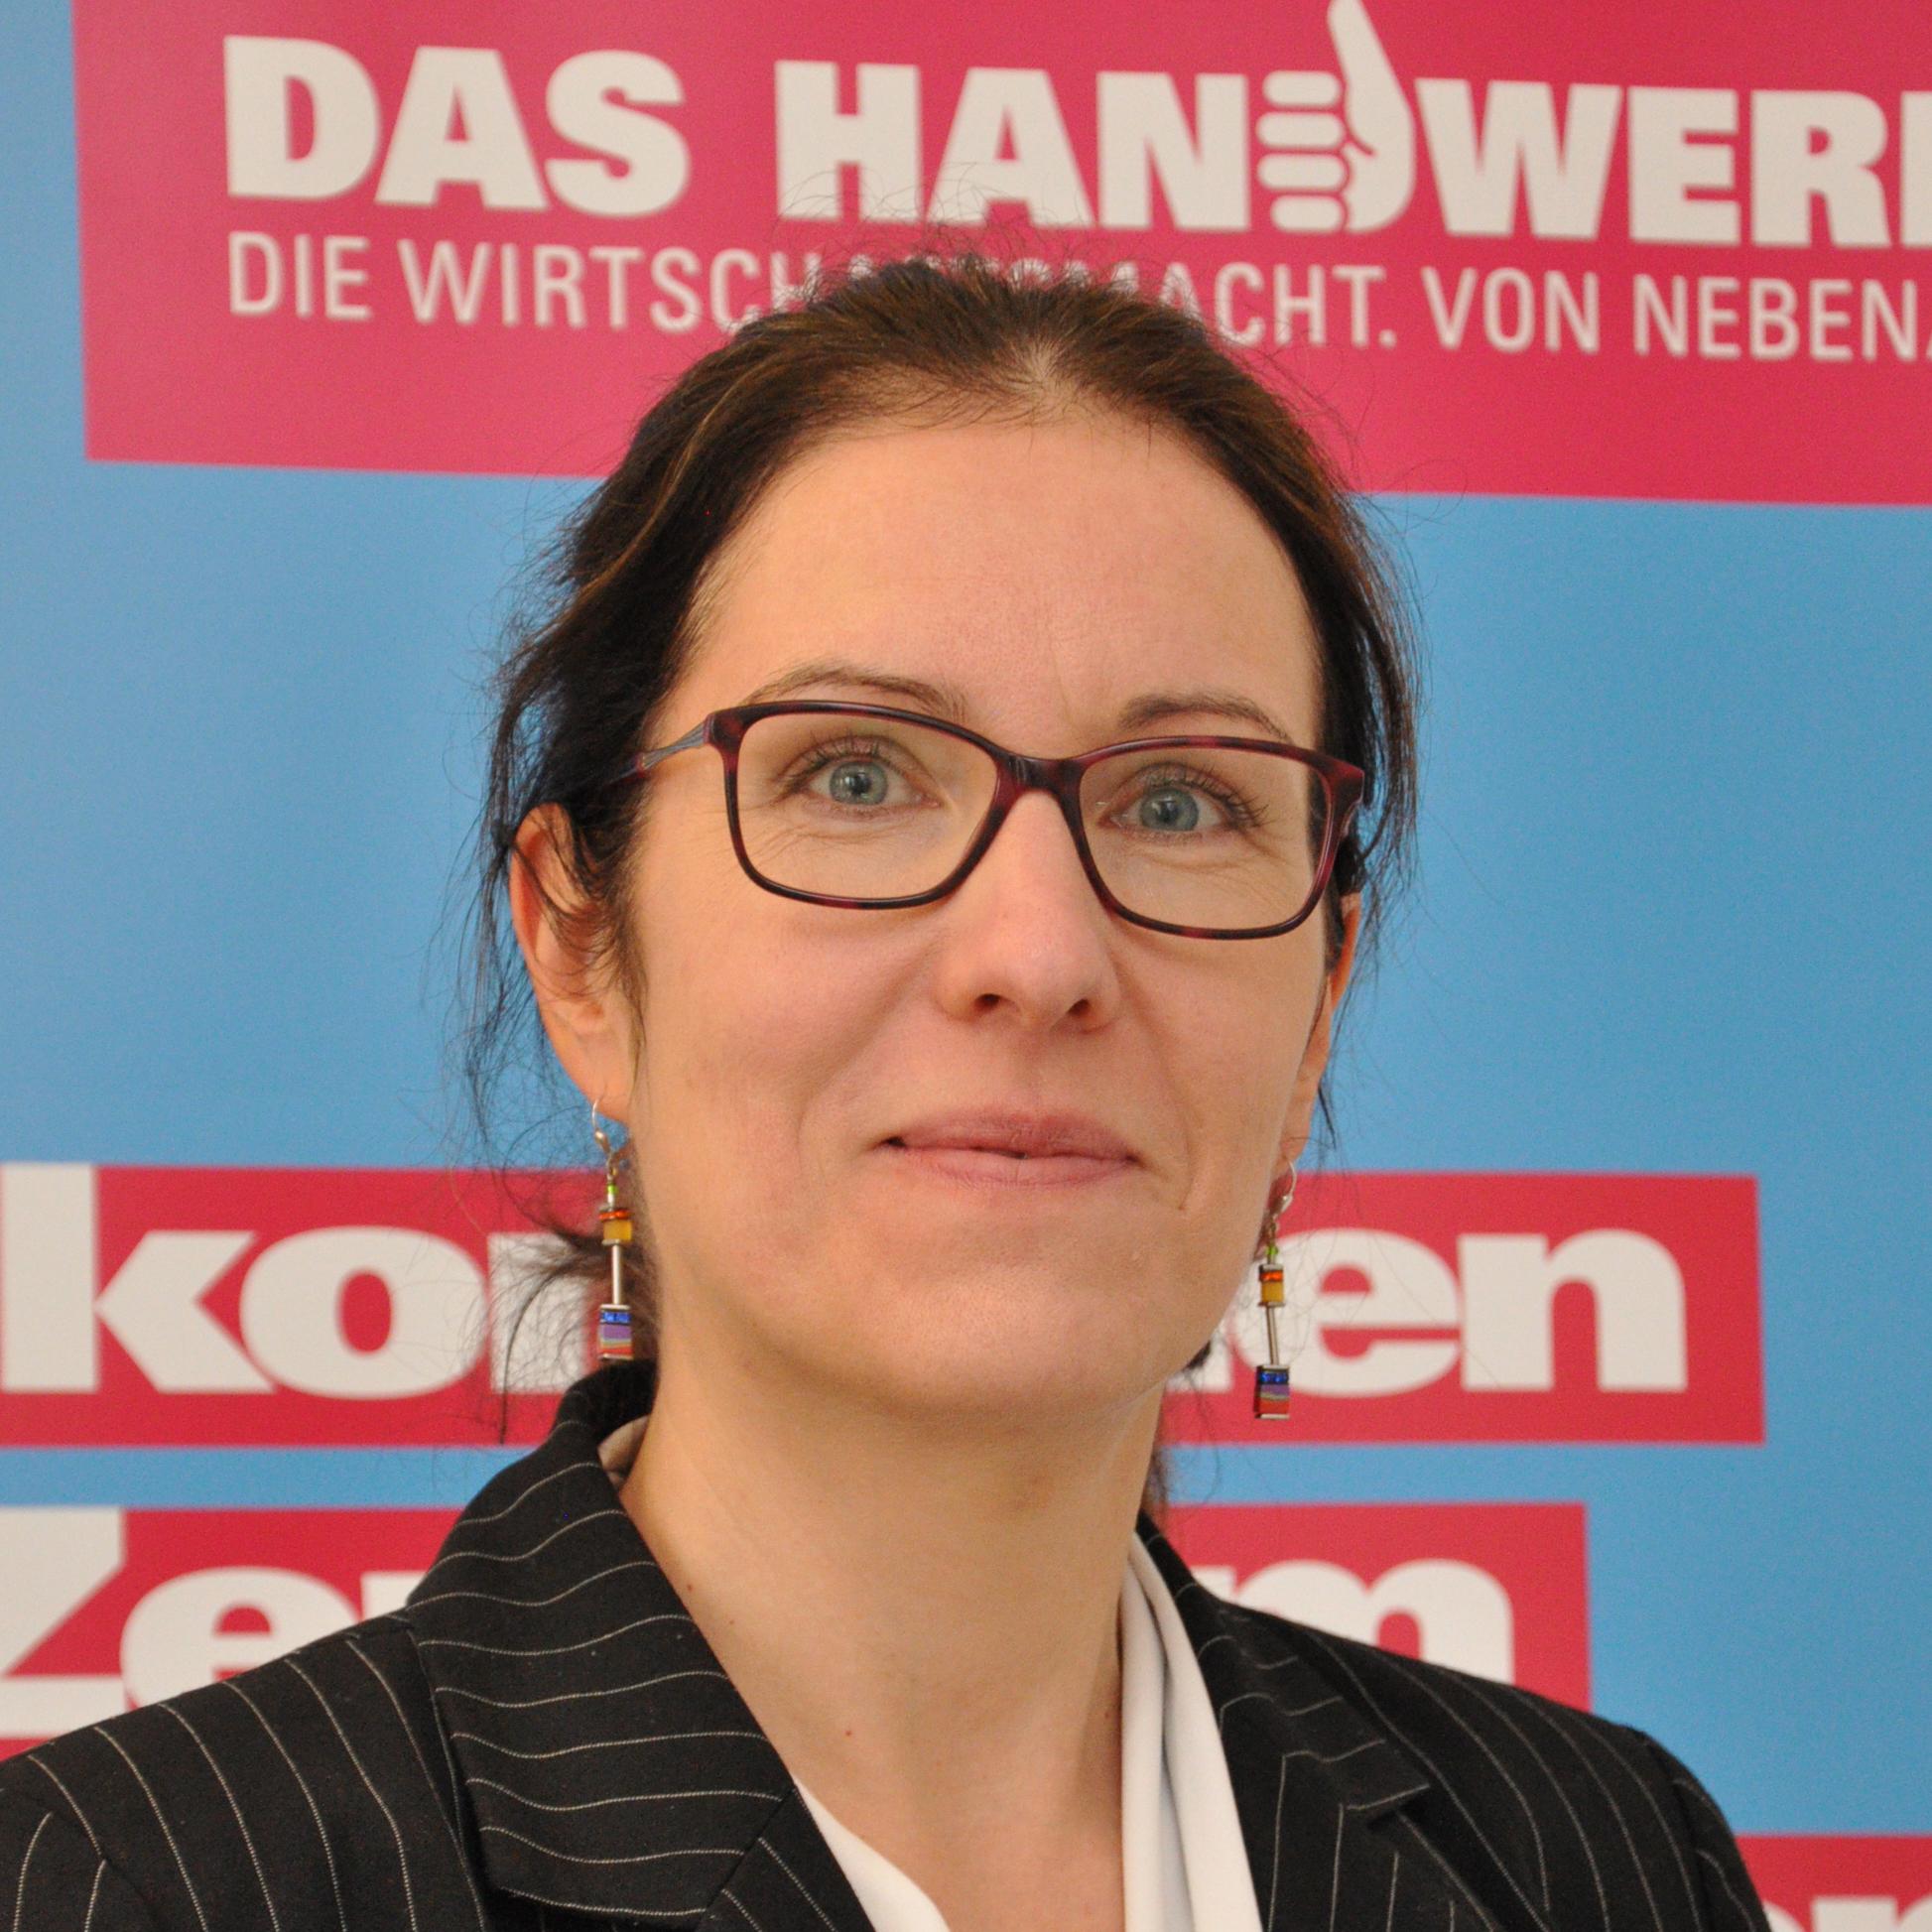 Sabine Aue